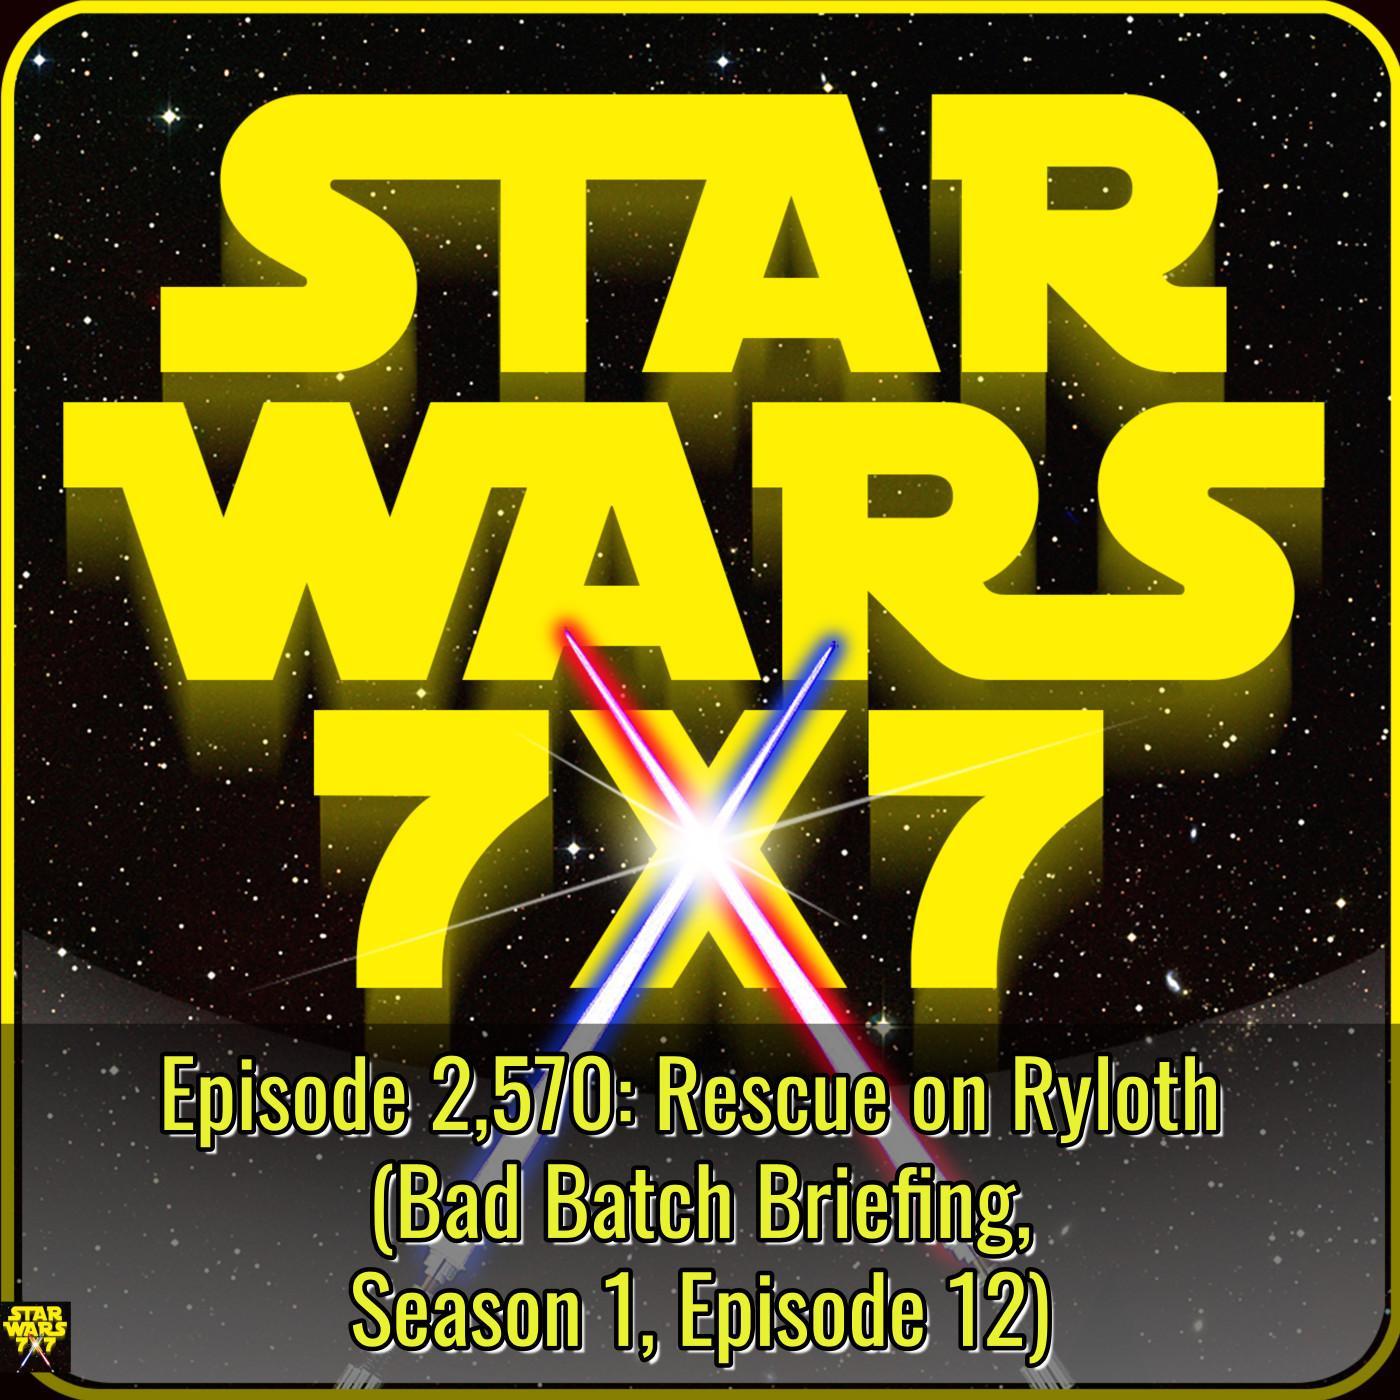 2,570. Rescue on Ryloth (Star Wars: Bad Batch Briefing, Season 1, Episode 12)